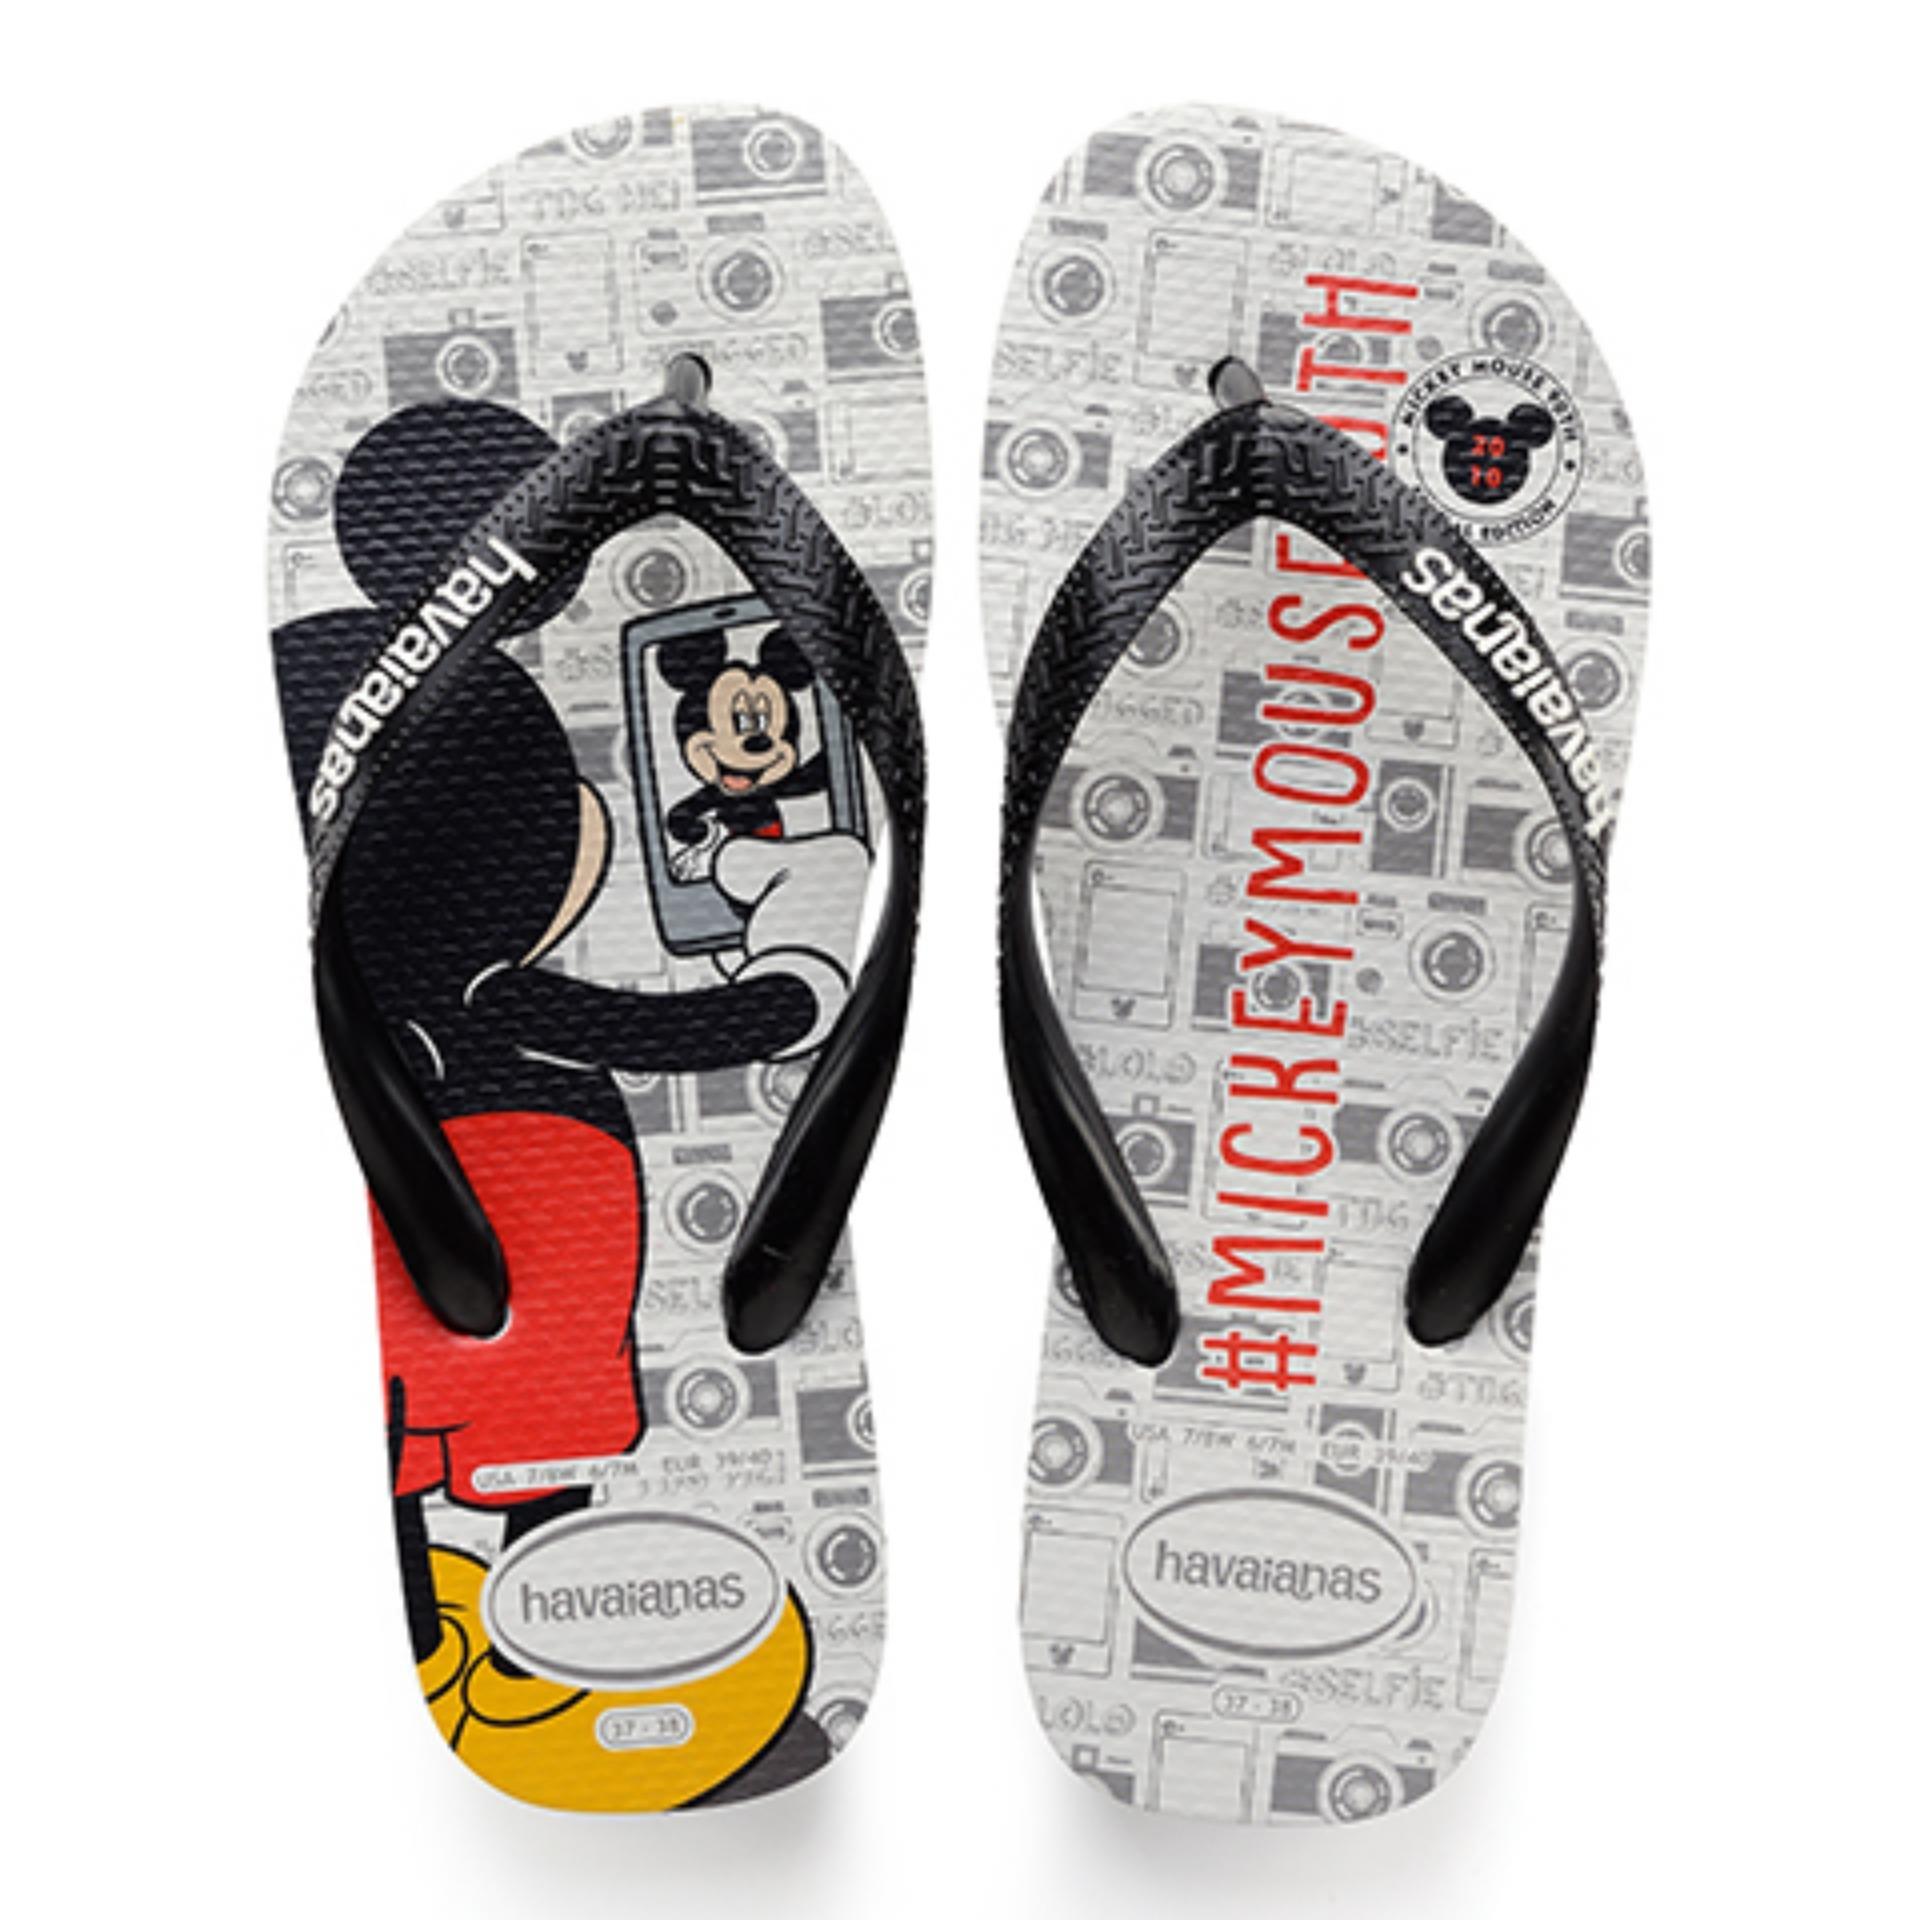 73f3832eefdb0 Havaianas Mickey 90th Anniversary - 2010 Flip Flops Unisex (Black Black) -  356